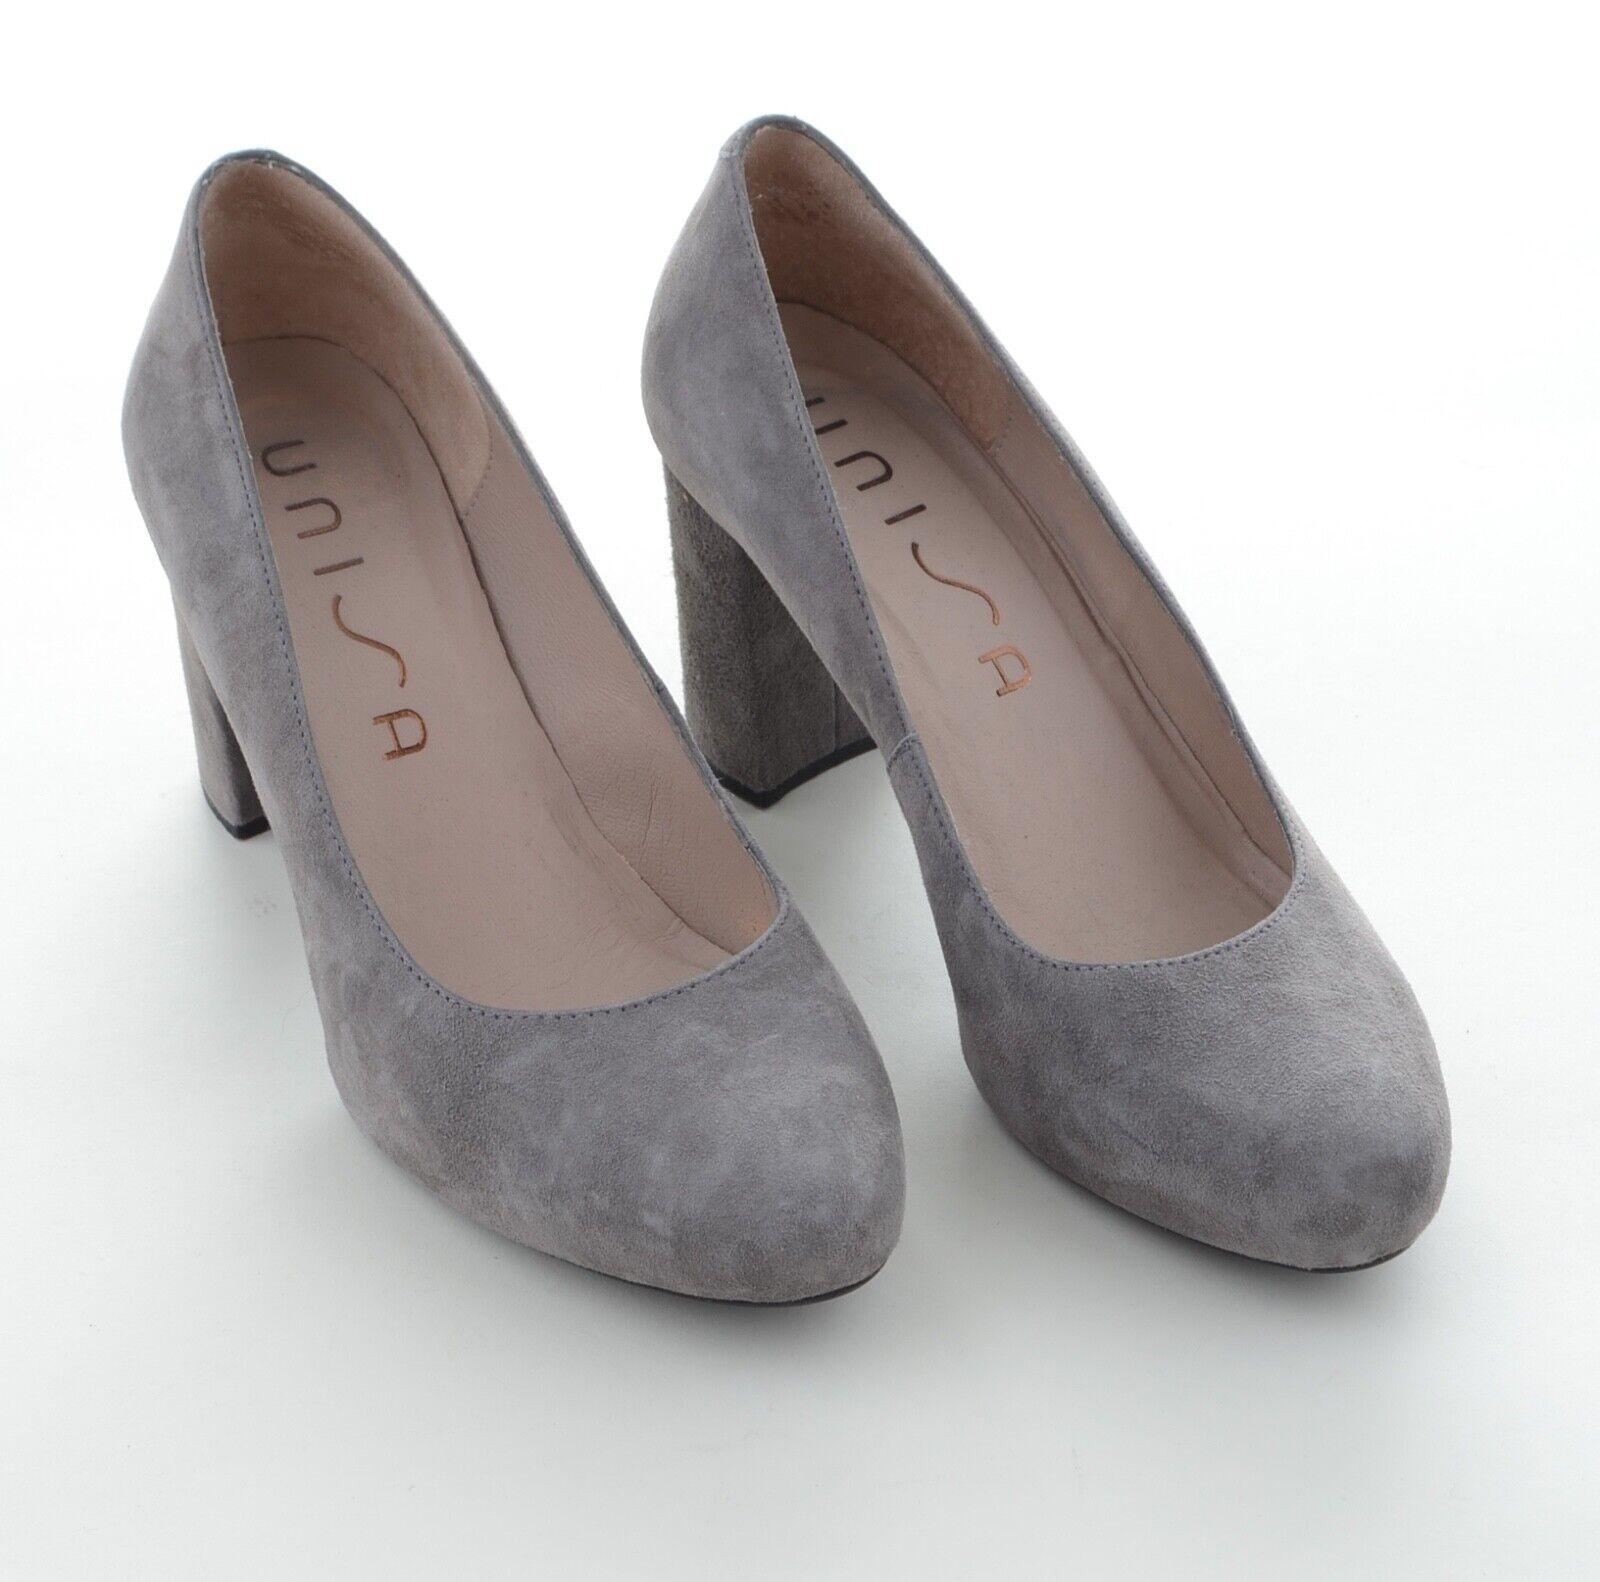 UNISA Designer Damen Schuhe Pumps High Heels Wild Leder Gr 38 Grau